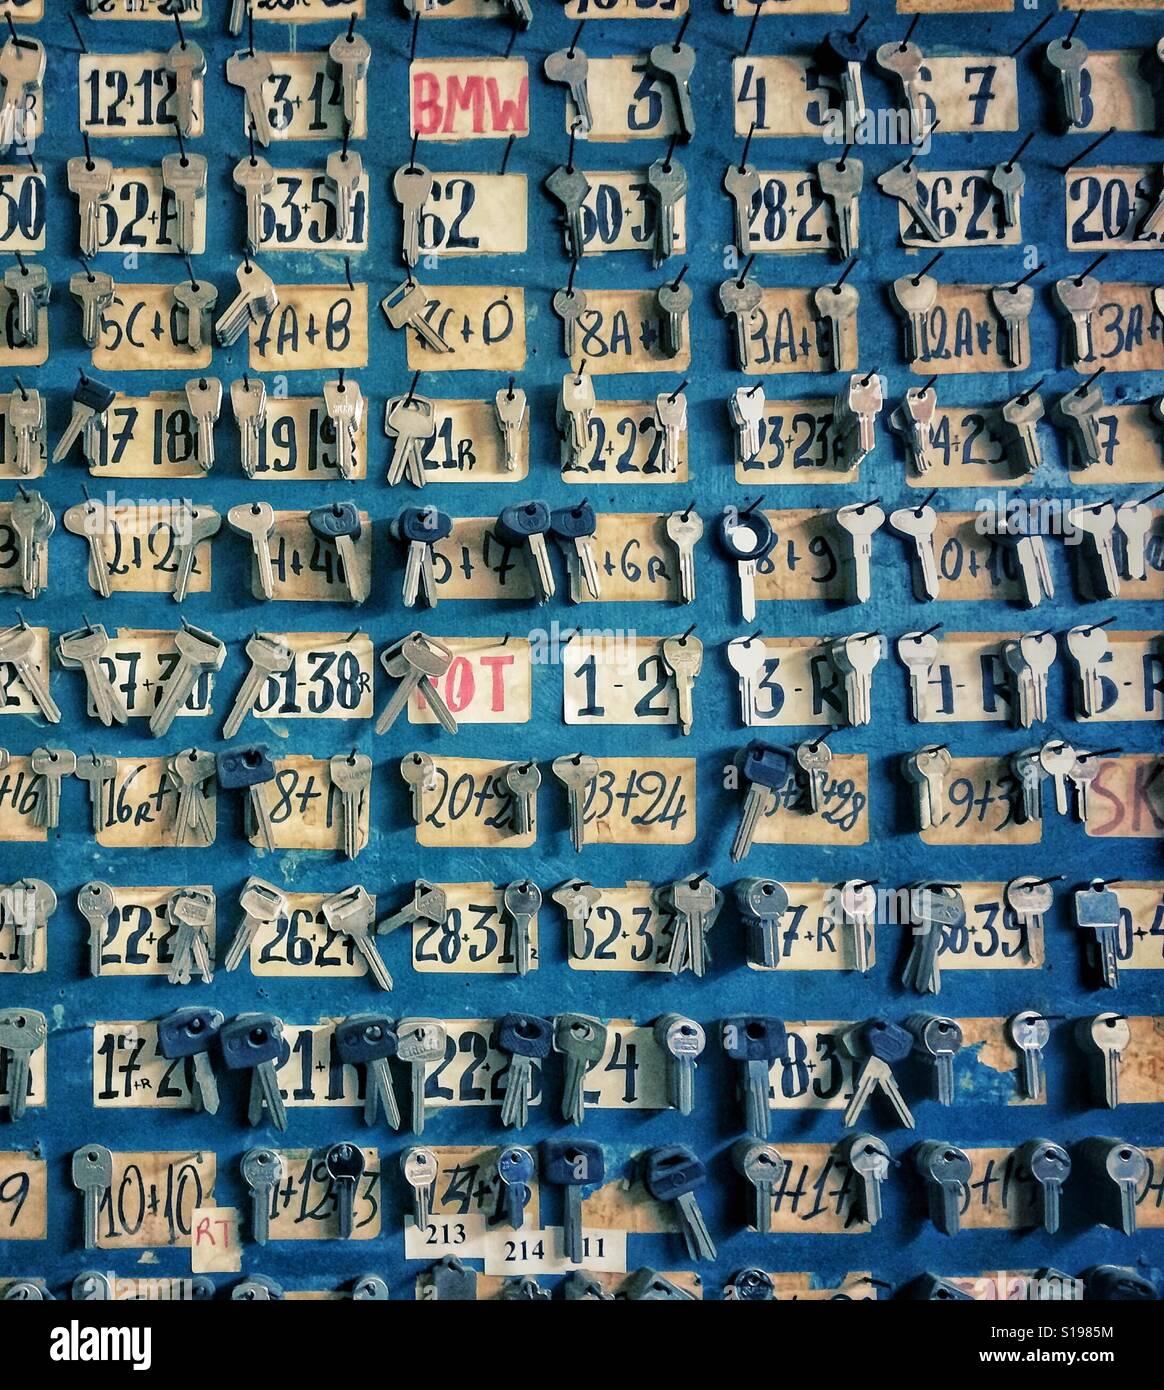 Uncut keys on a wall close-up - Stock Image